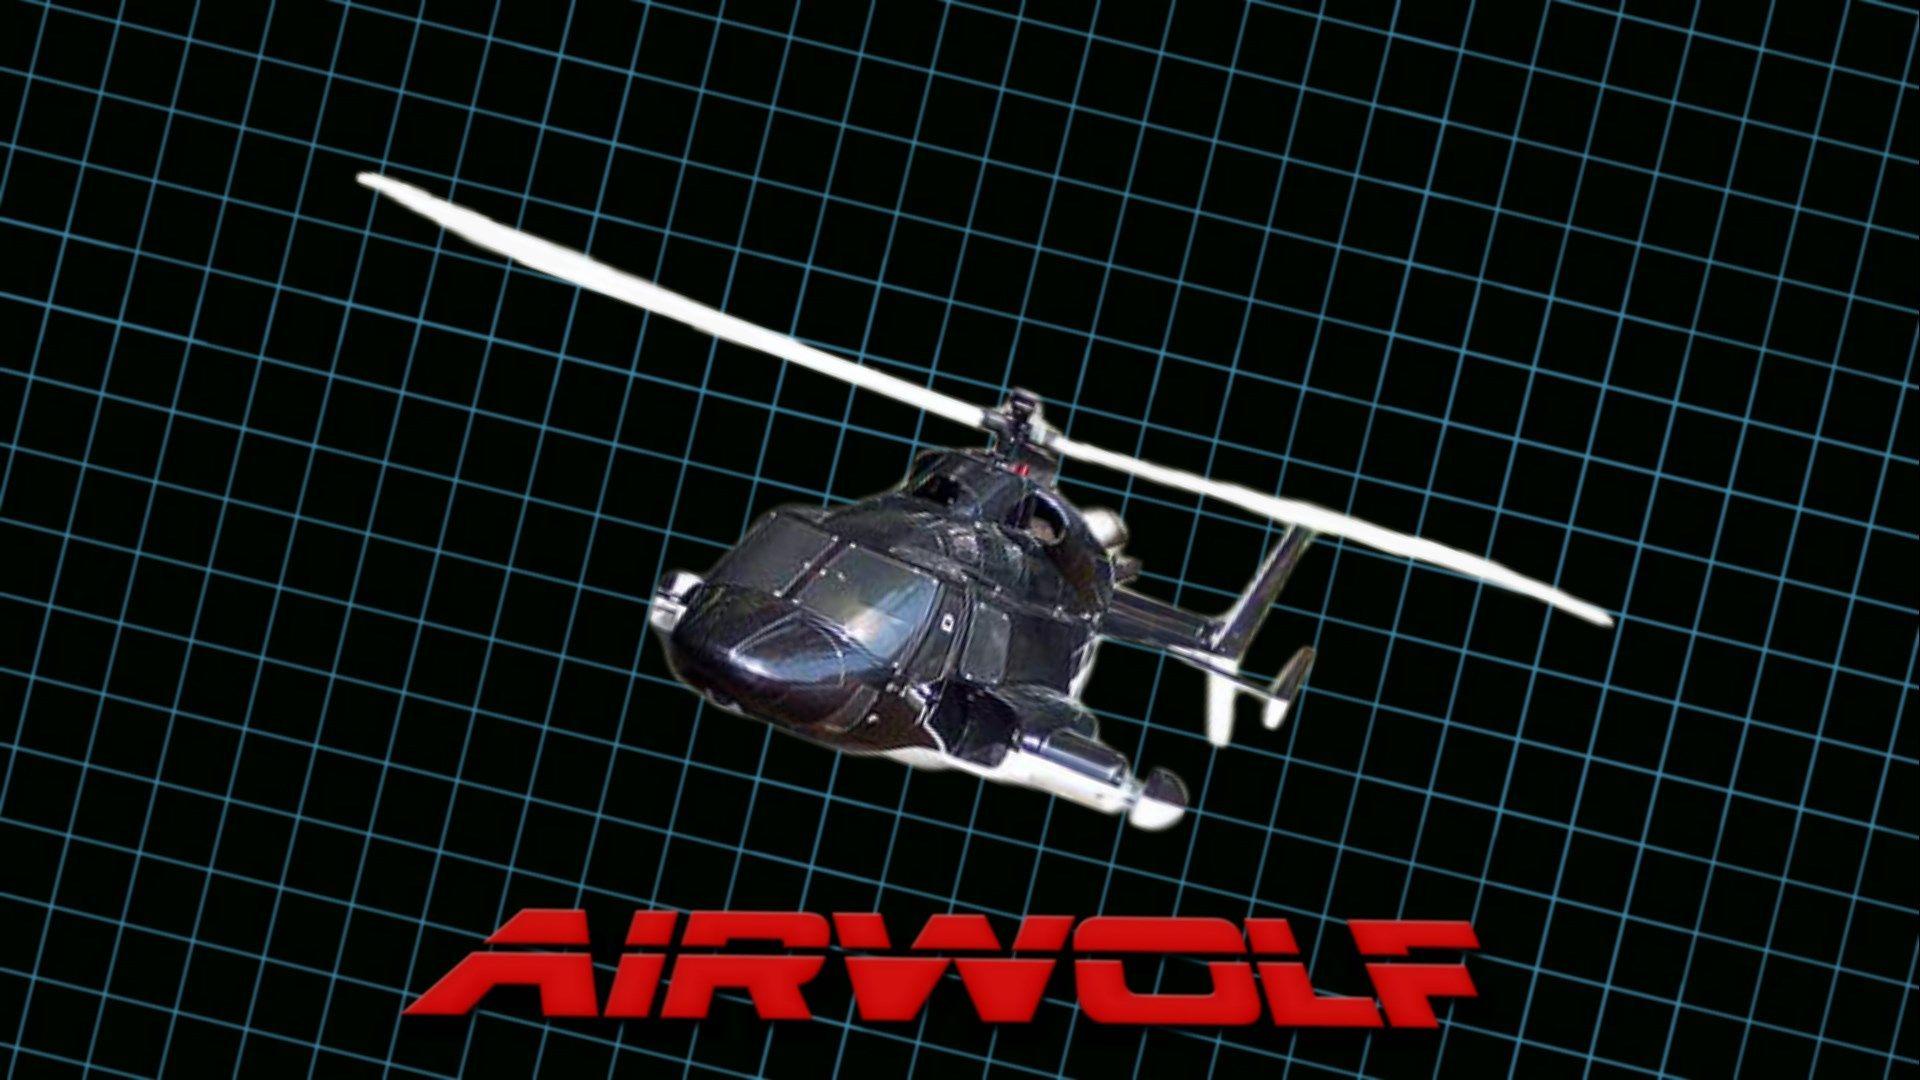 airwolf full movie 1984 free download